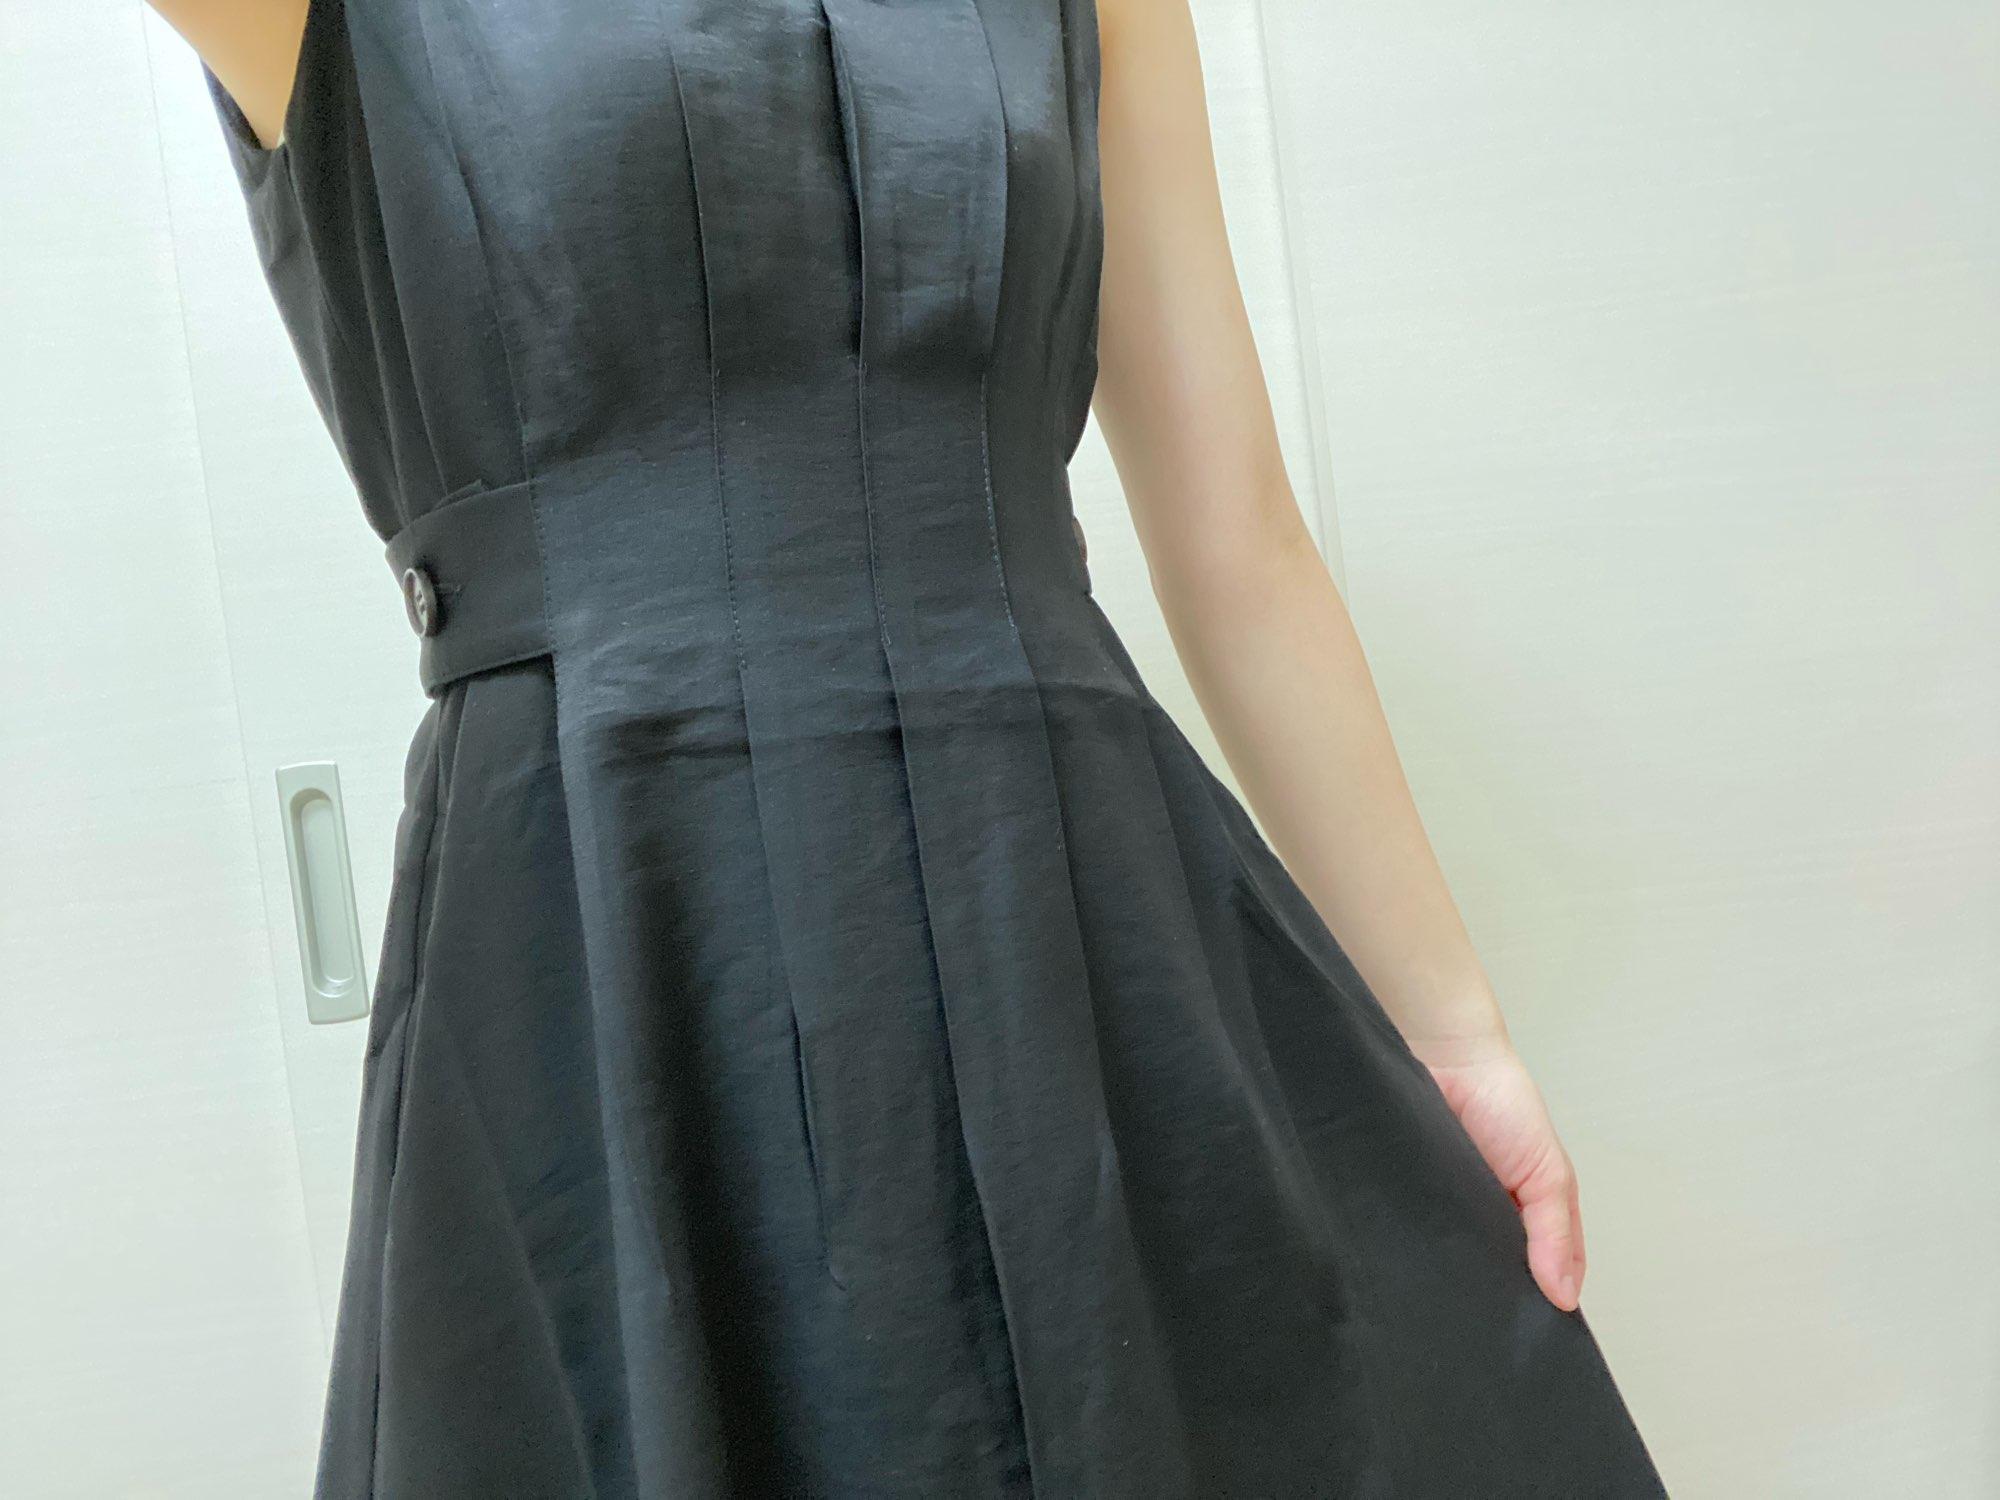 2021 Summer Women Solid White Black Fashion Elegant Casual Party Dress O neck Sleeveless Tank Sundress Female Vestido|Dresses|   - AliExpress